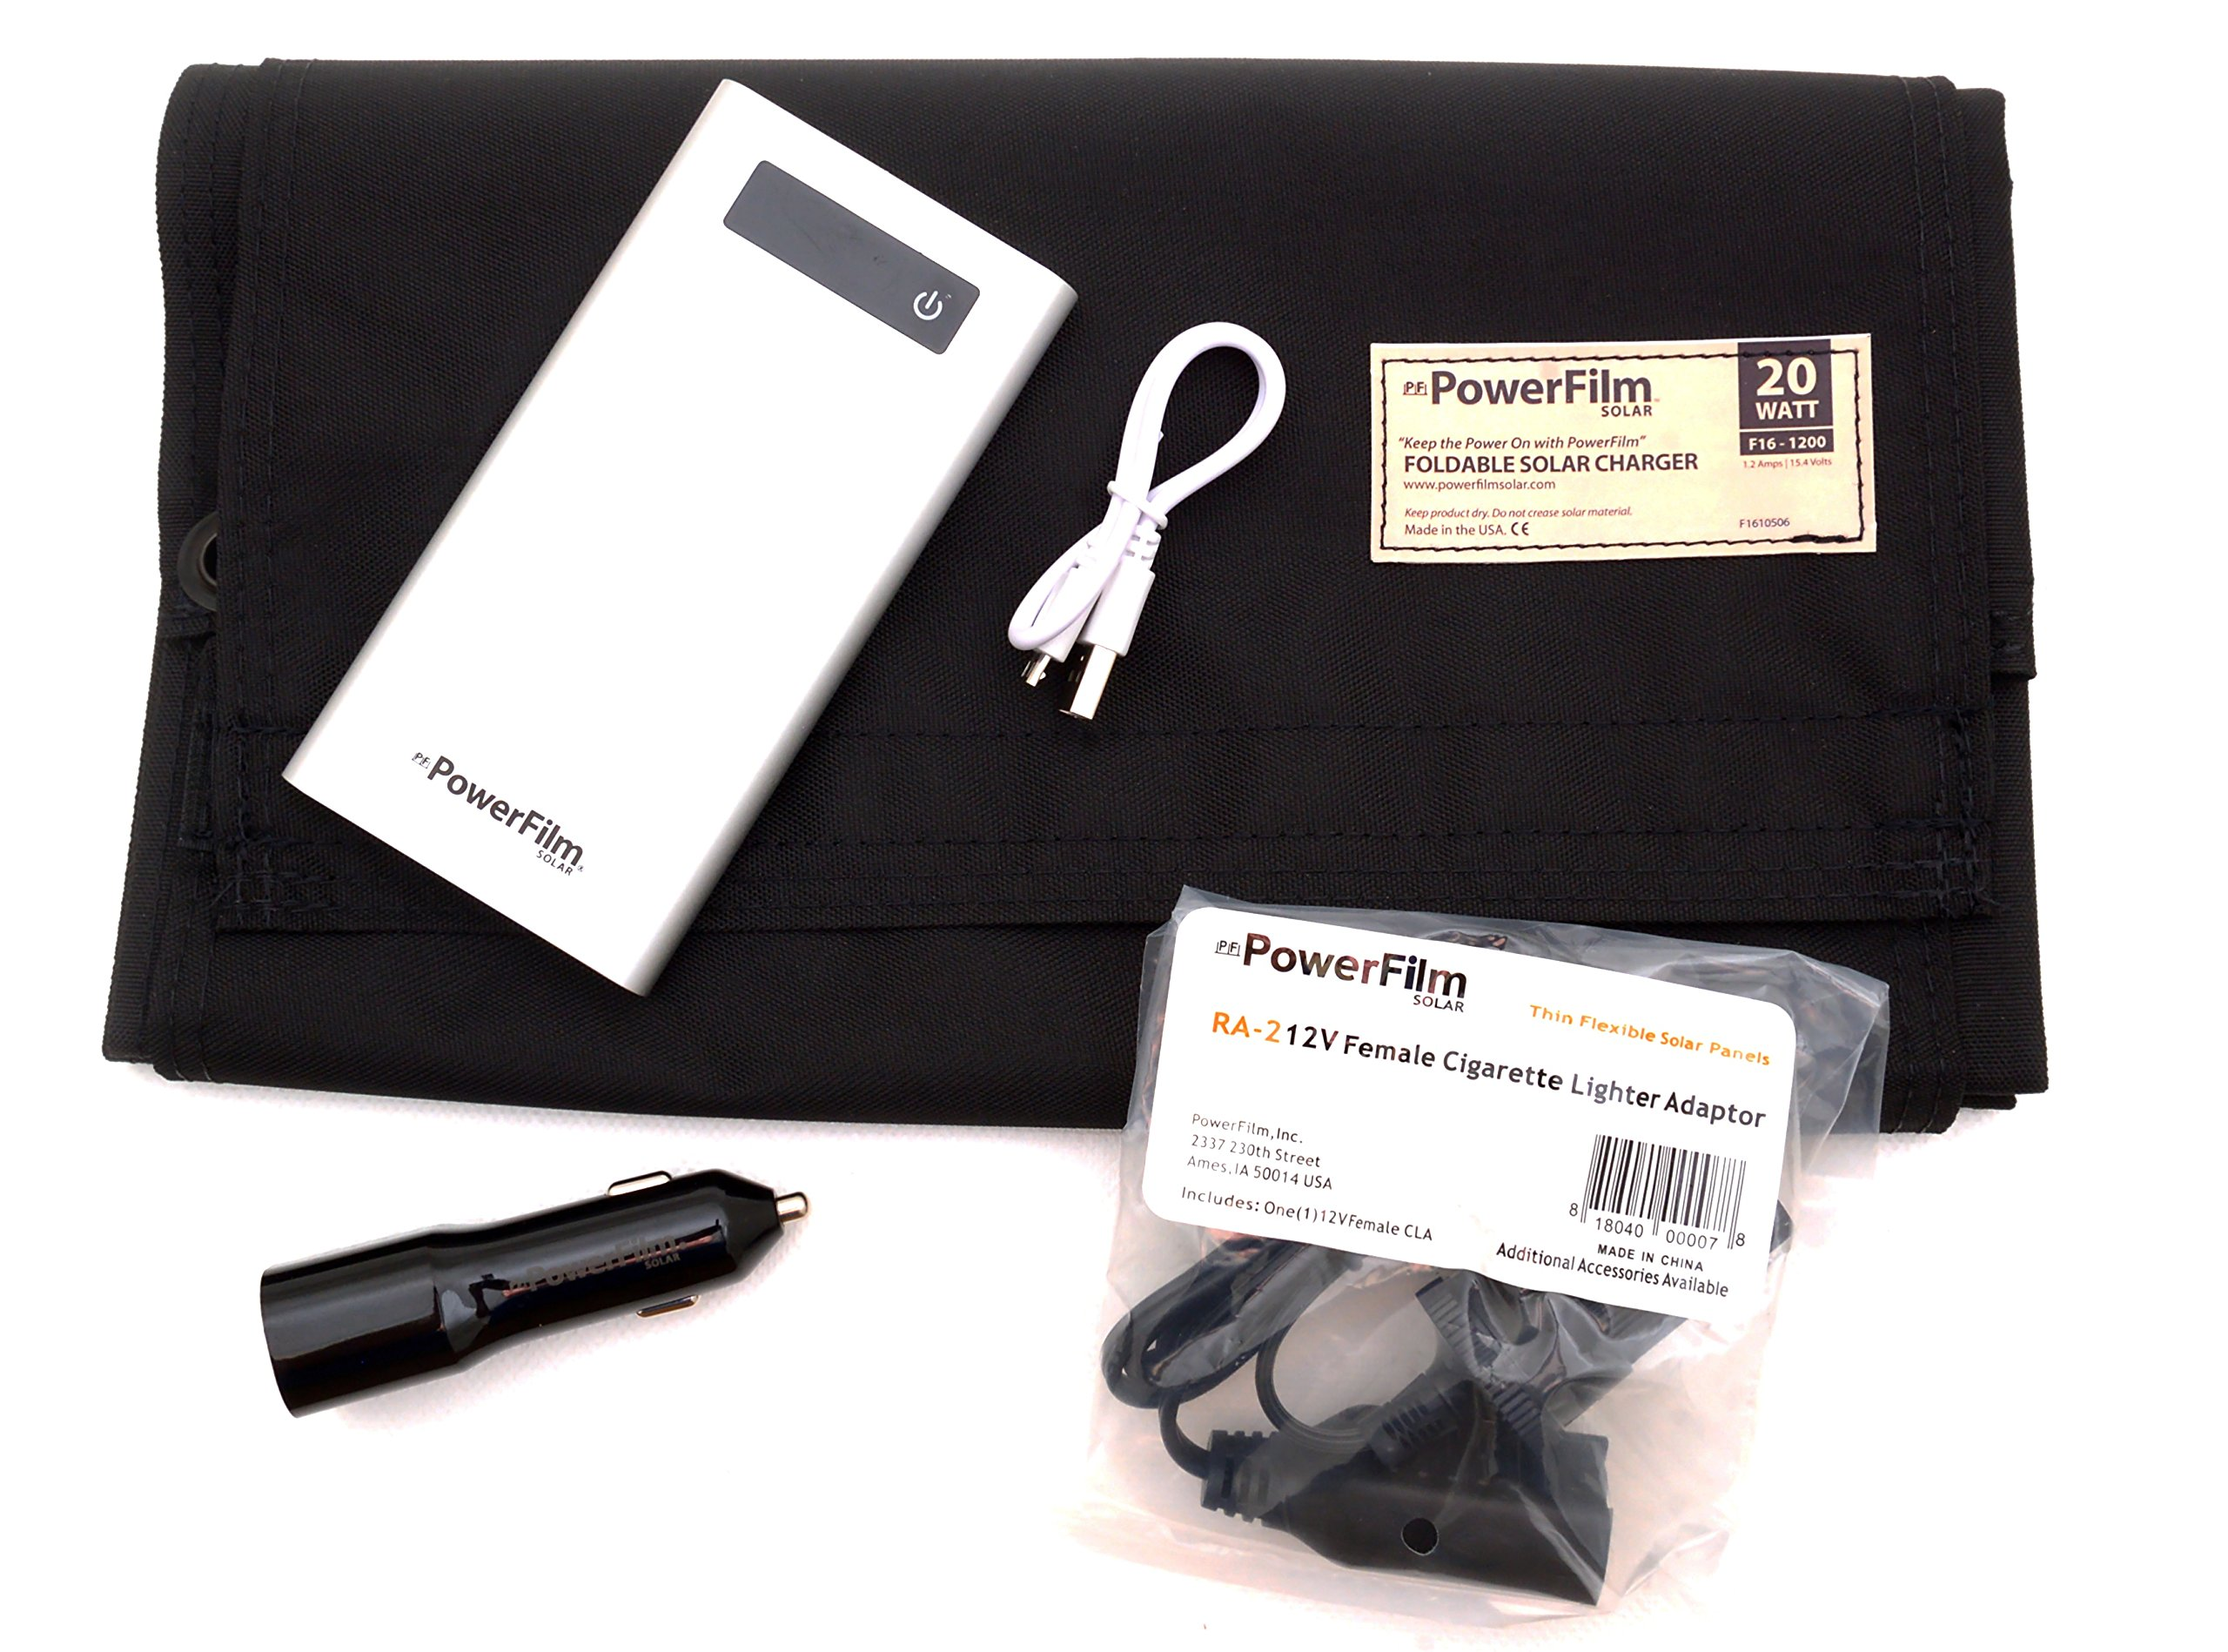 PowerFilm Solar 20 Watt Power Bank Kit